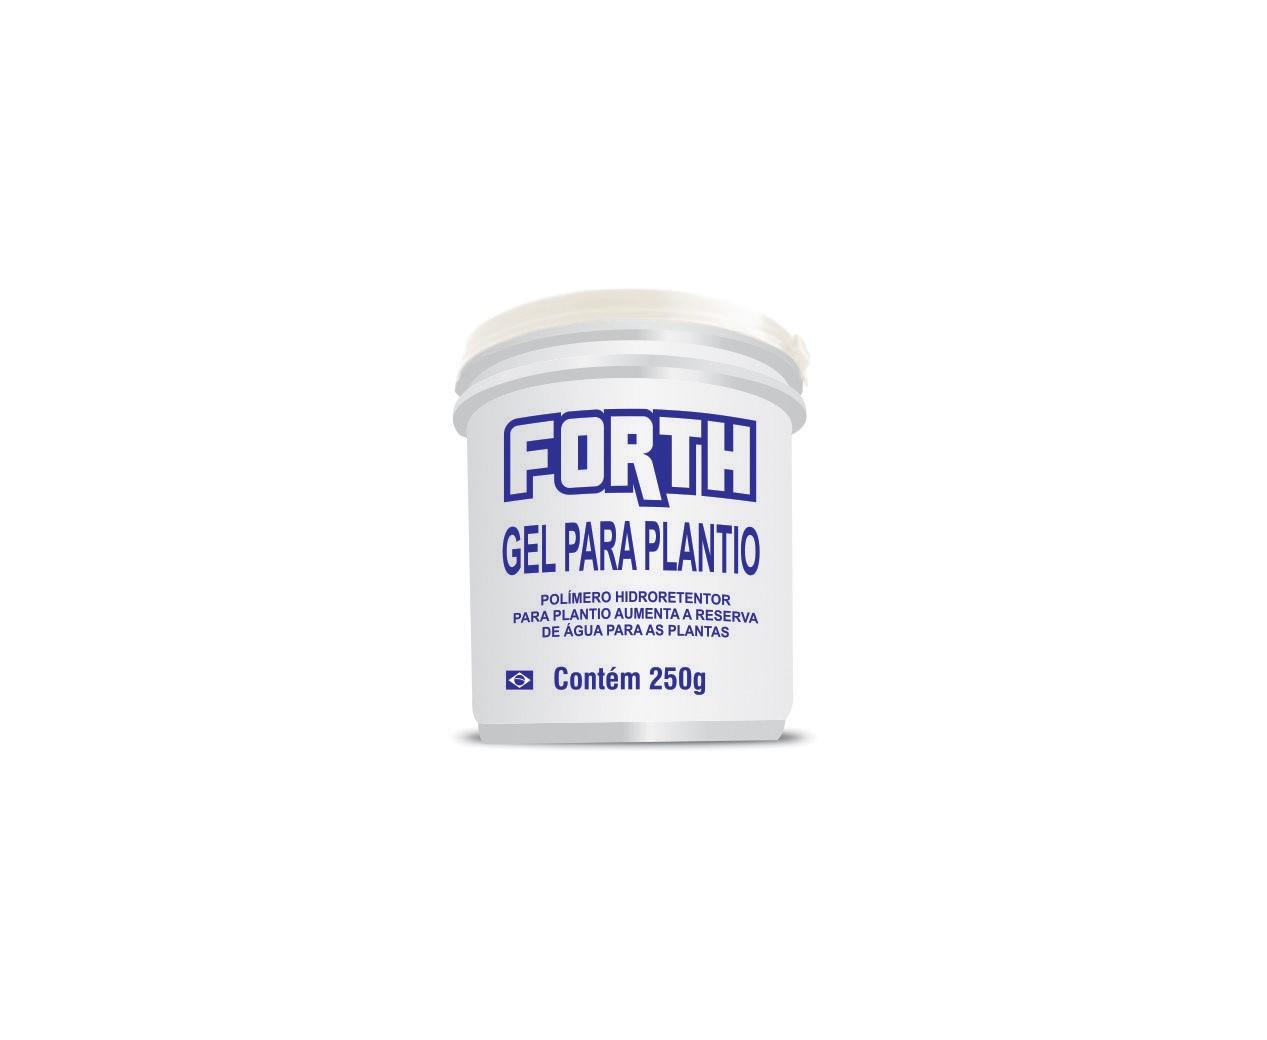 Gel para Plantio FORTH 250g